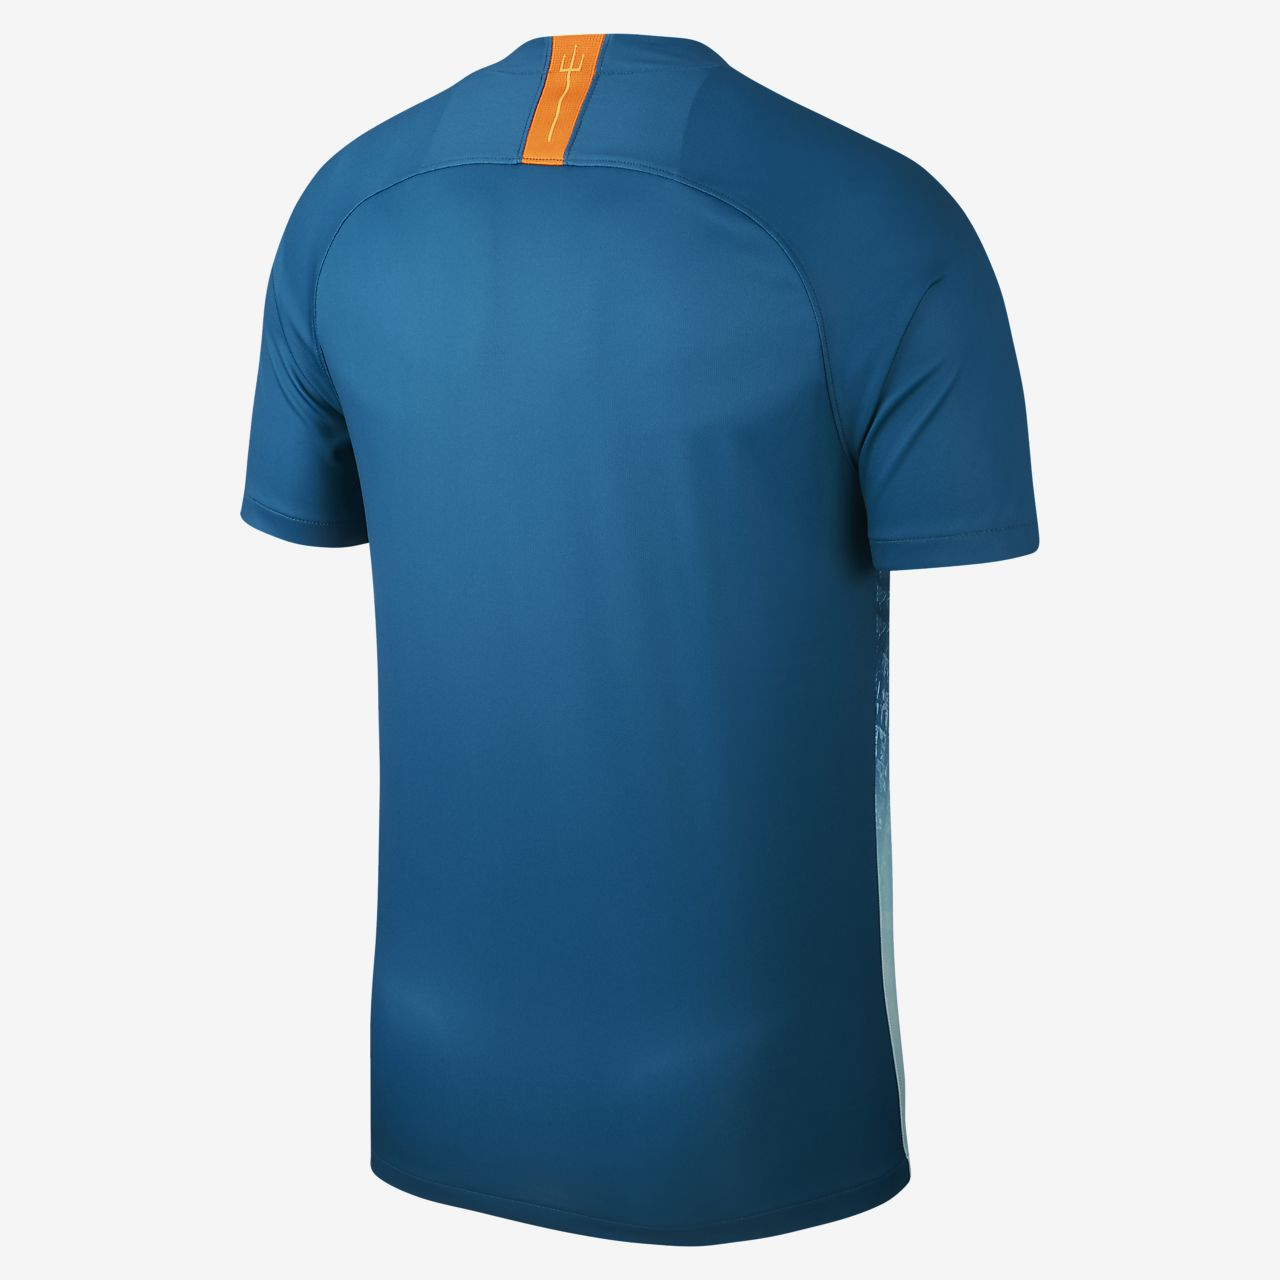 0101e17bbd462 ... Camiseta de fútbol para hombre alternativa Stadium del Atlético de Madrid  2018 19